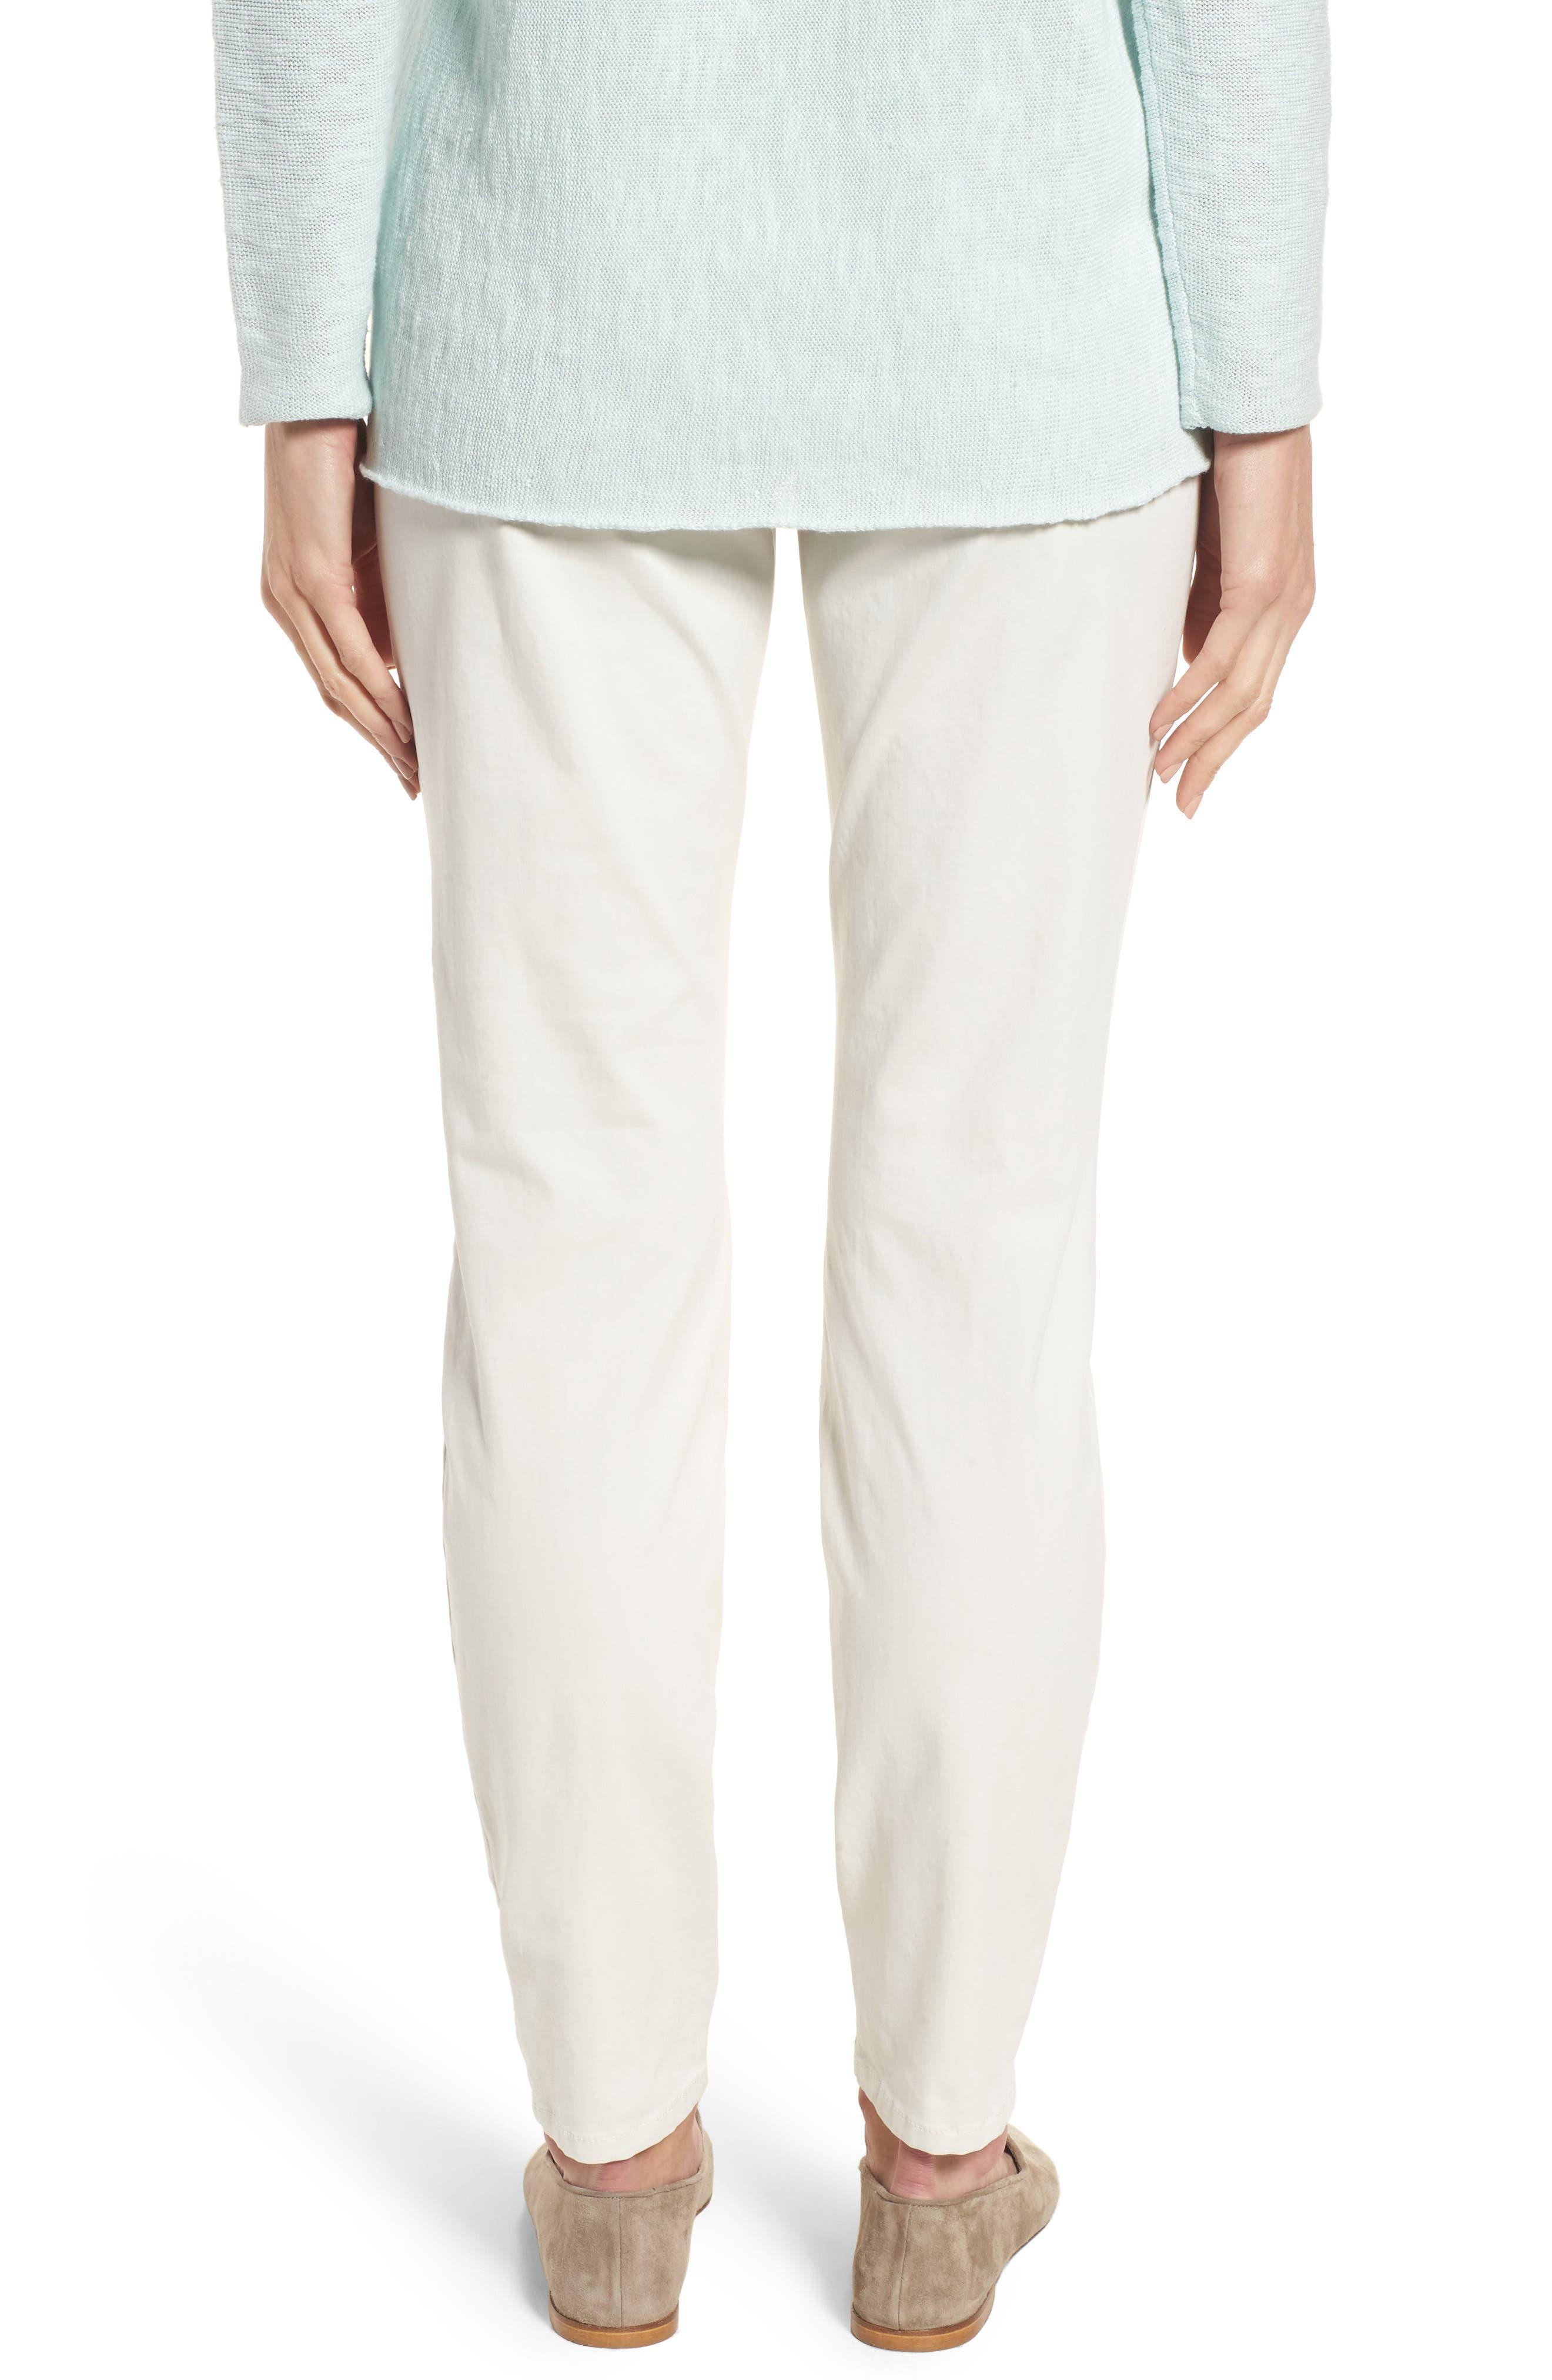 Stretch Organic Cotton Denim Skinny Pants,                             Alternate thumbnail 2, color,                             Bone